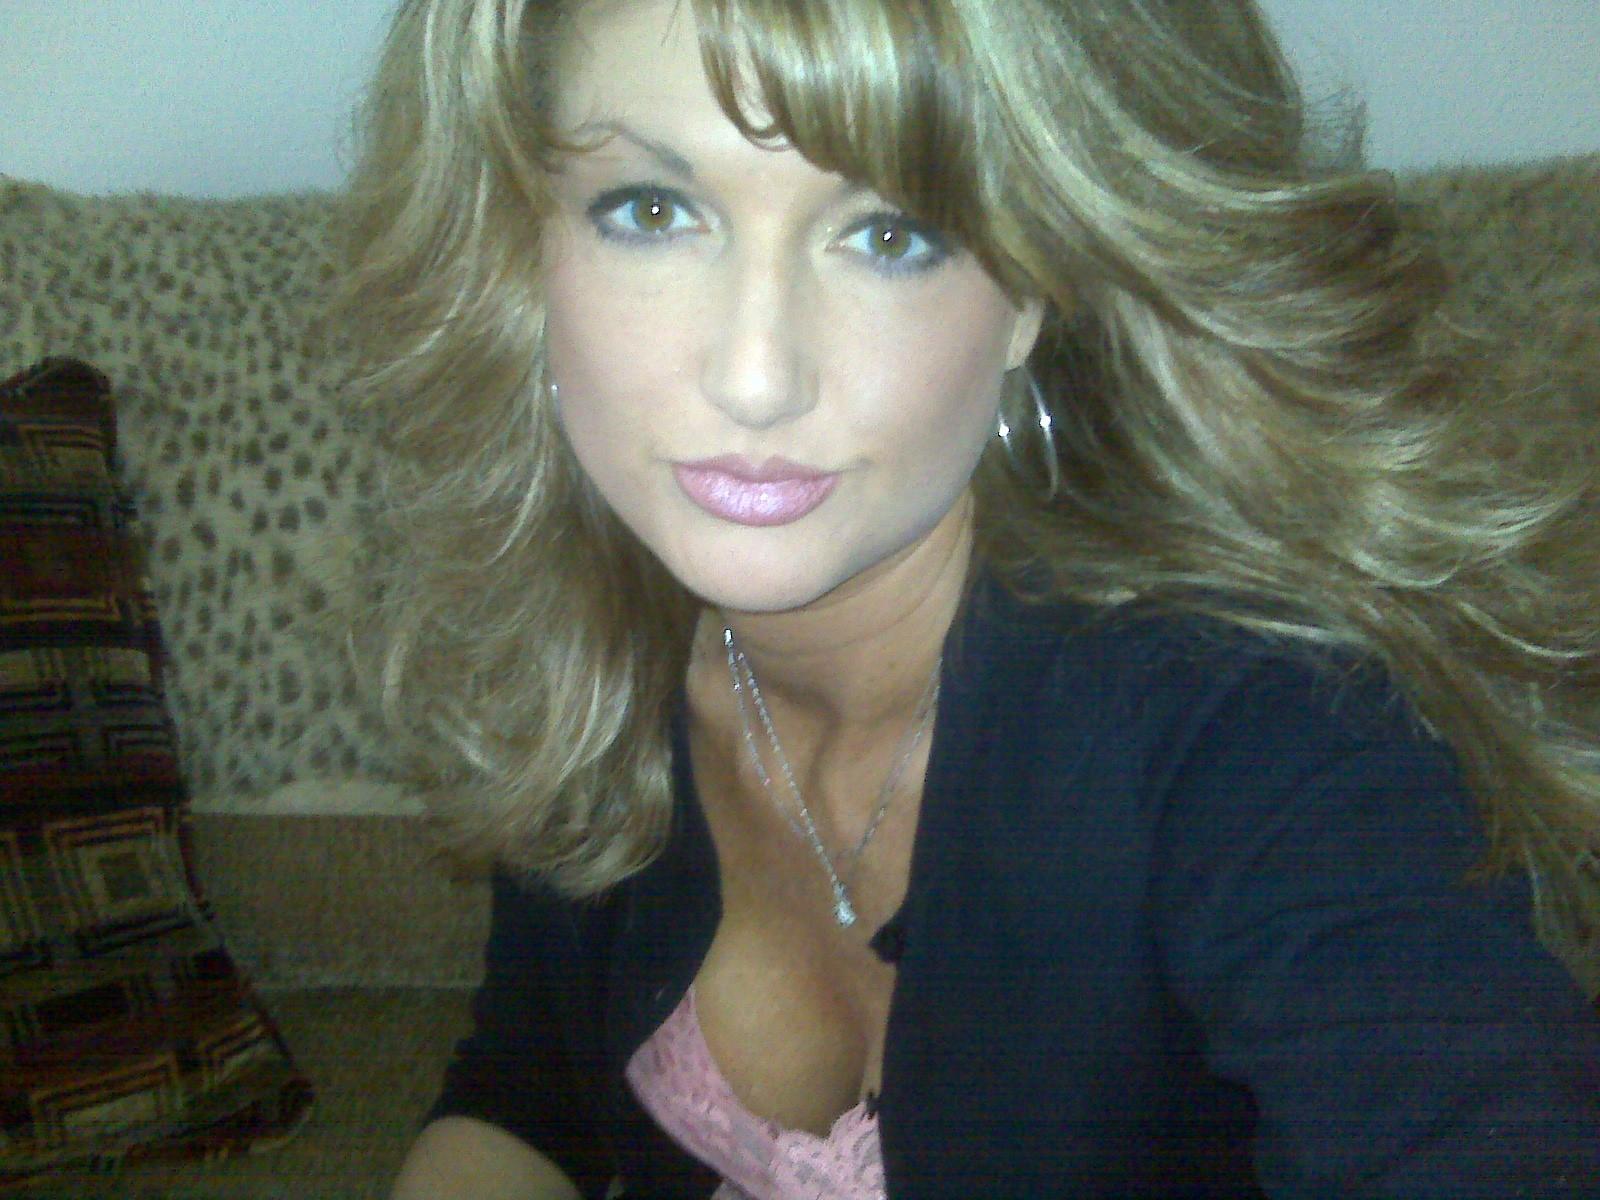 Dating slutwife blond hot geologisk